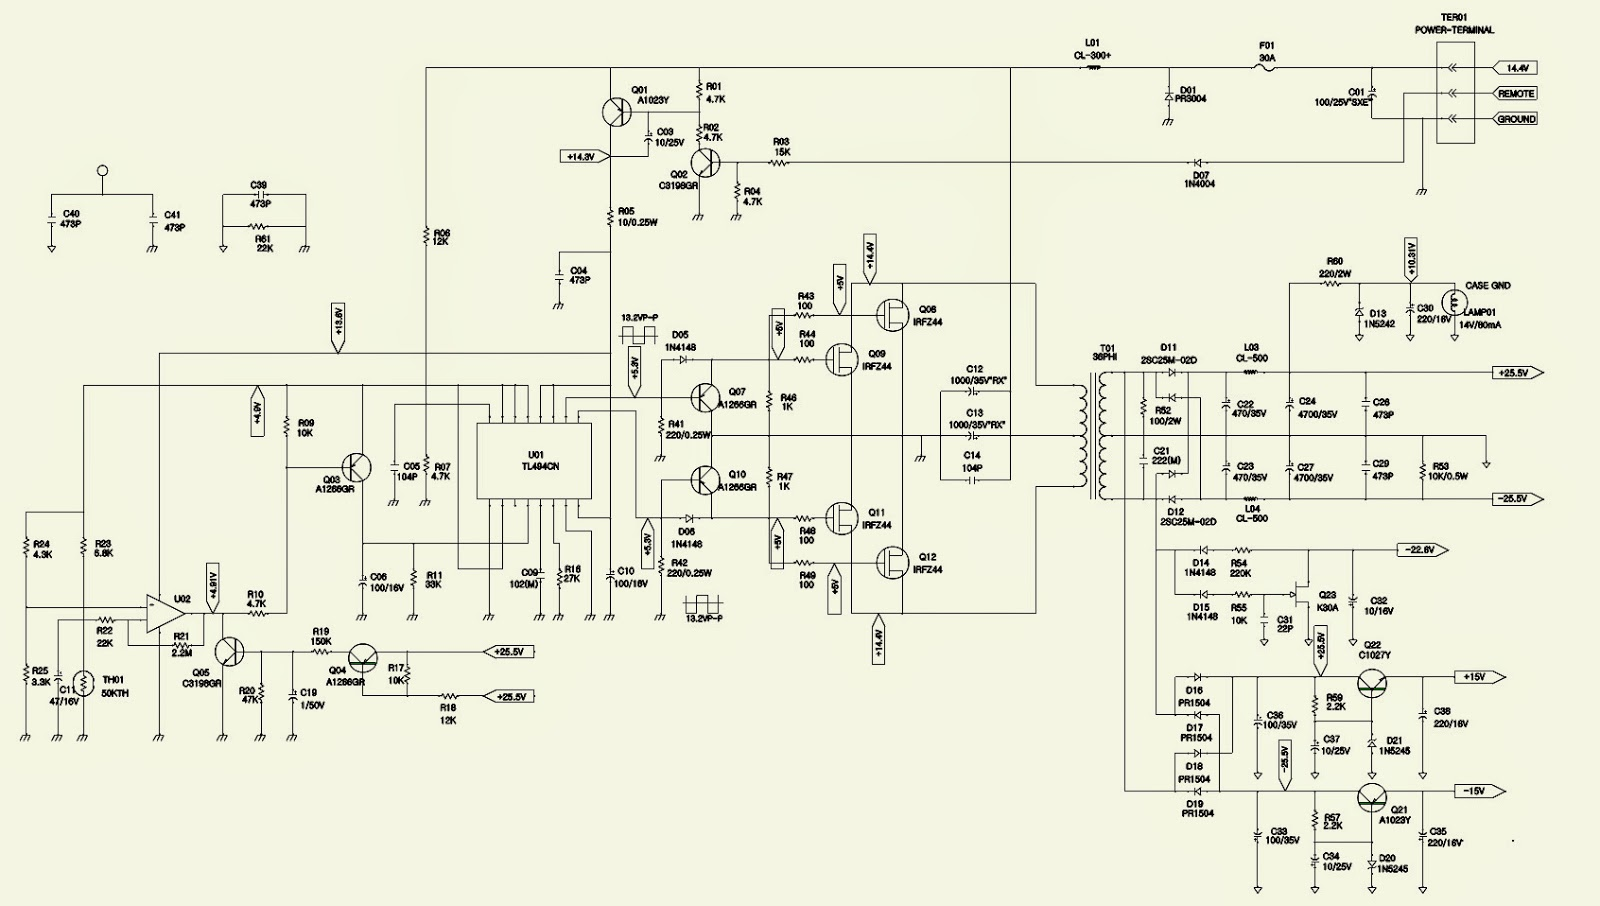 JBL DA3504  WIRING DIAGRAM  Amplifier Schematic  CAR